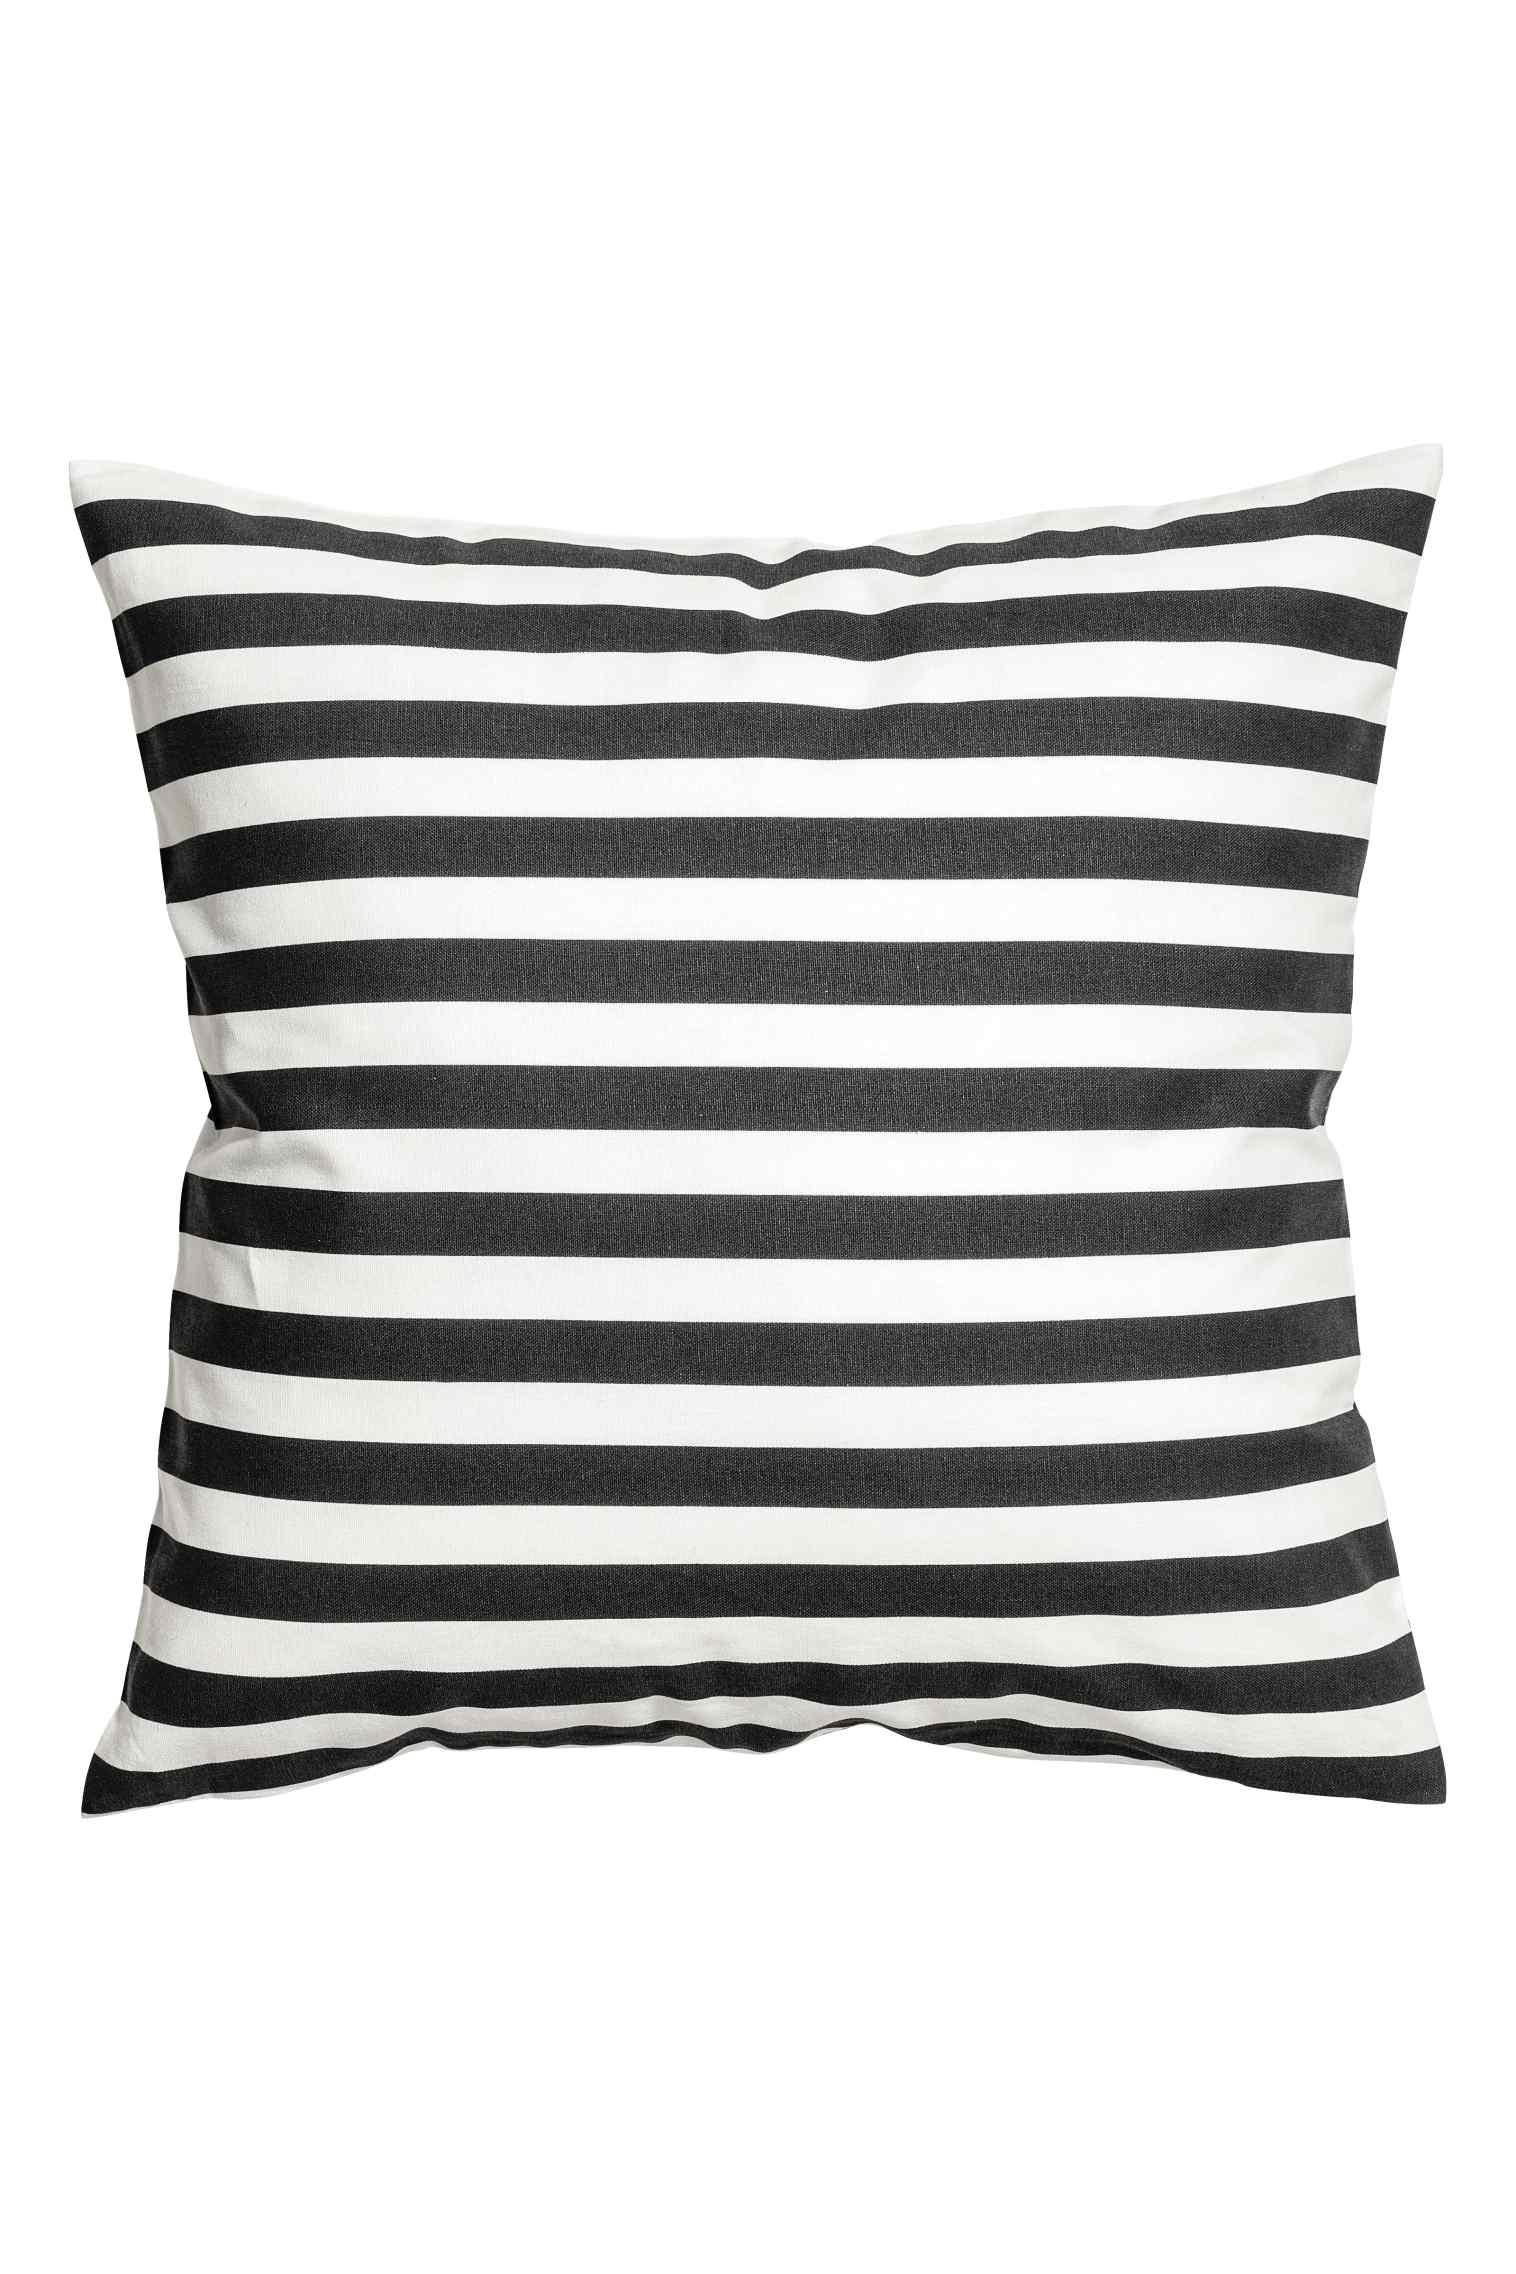 Striped cushion cover, $7